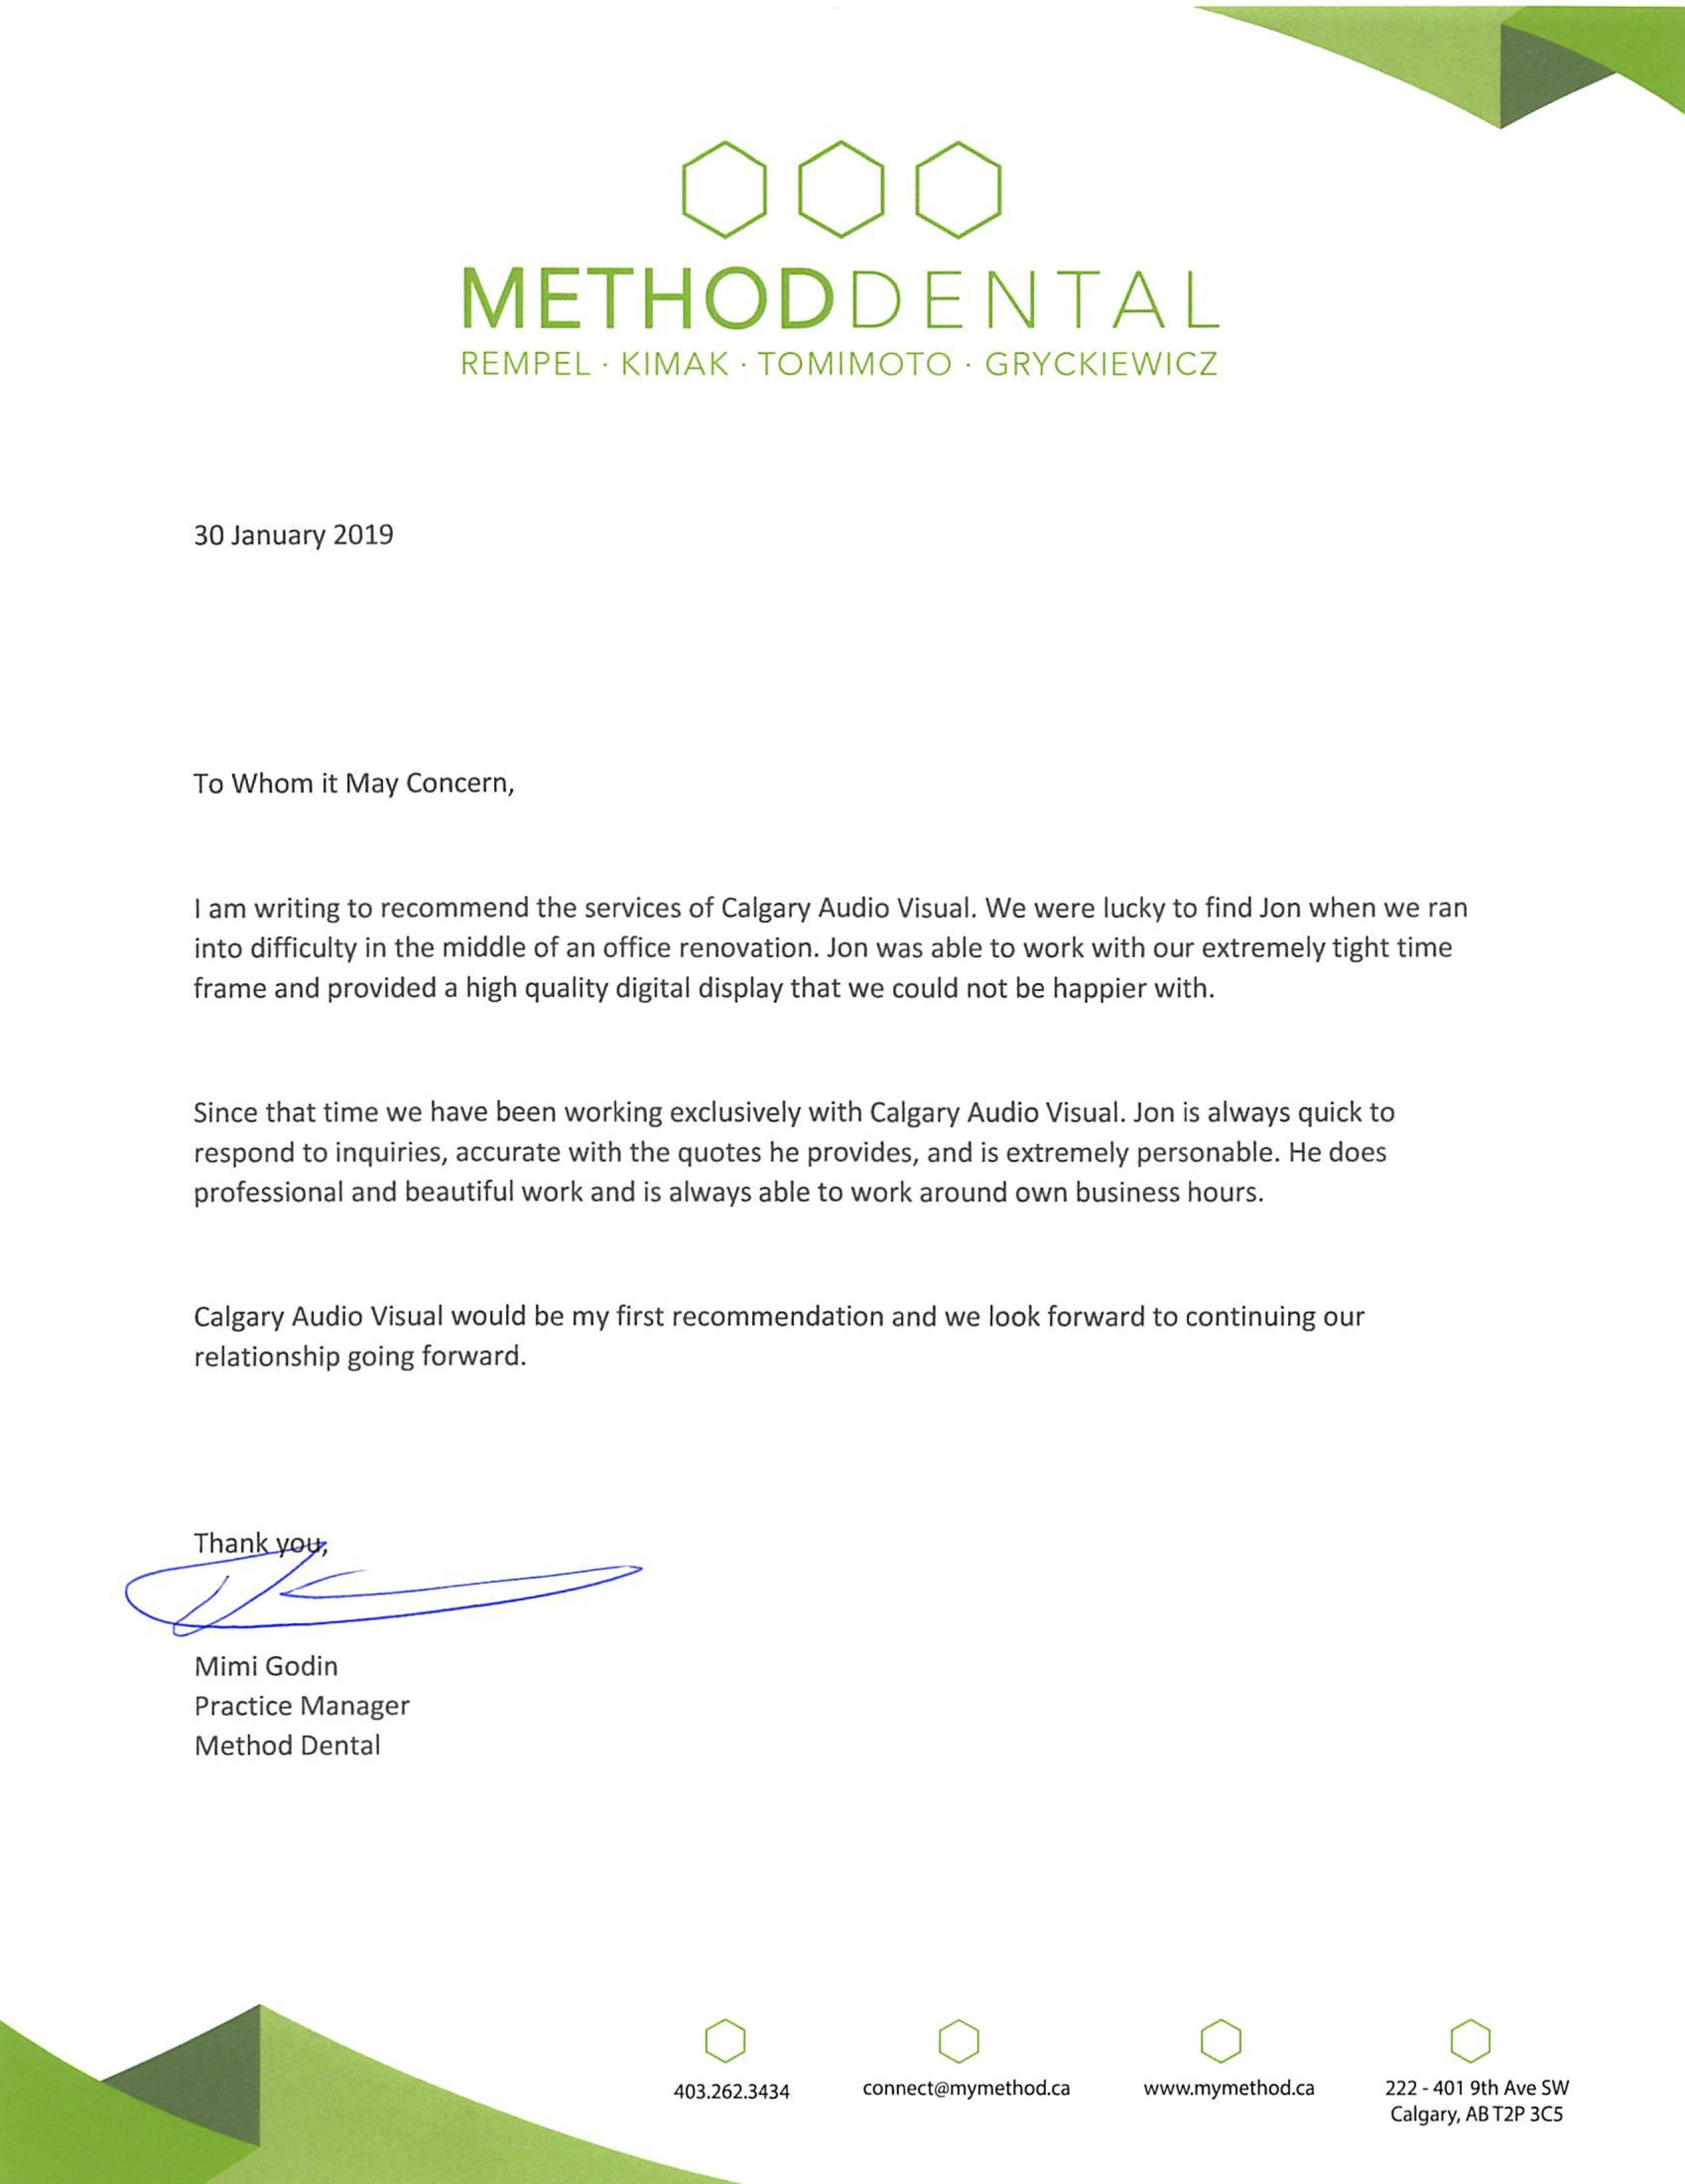 Method_Dental-Jan30-2019.jpg